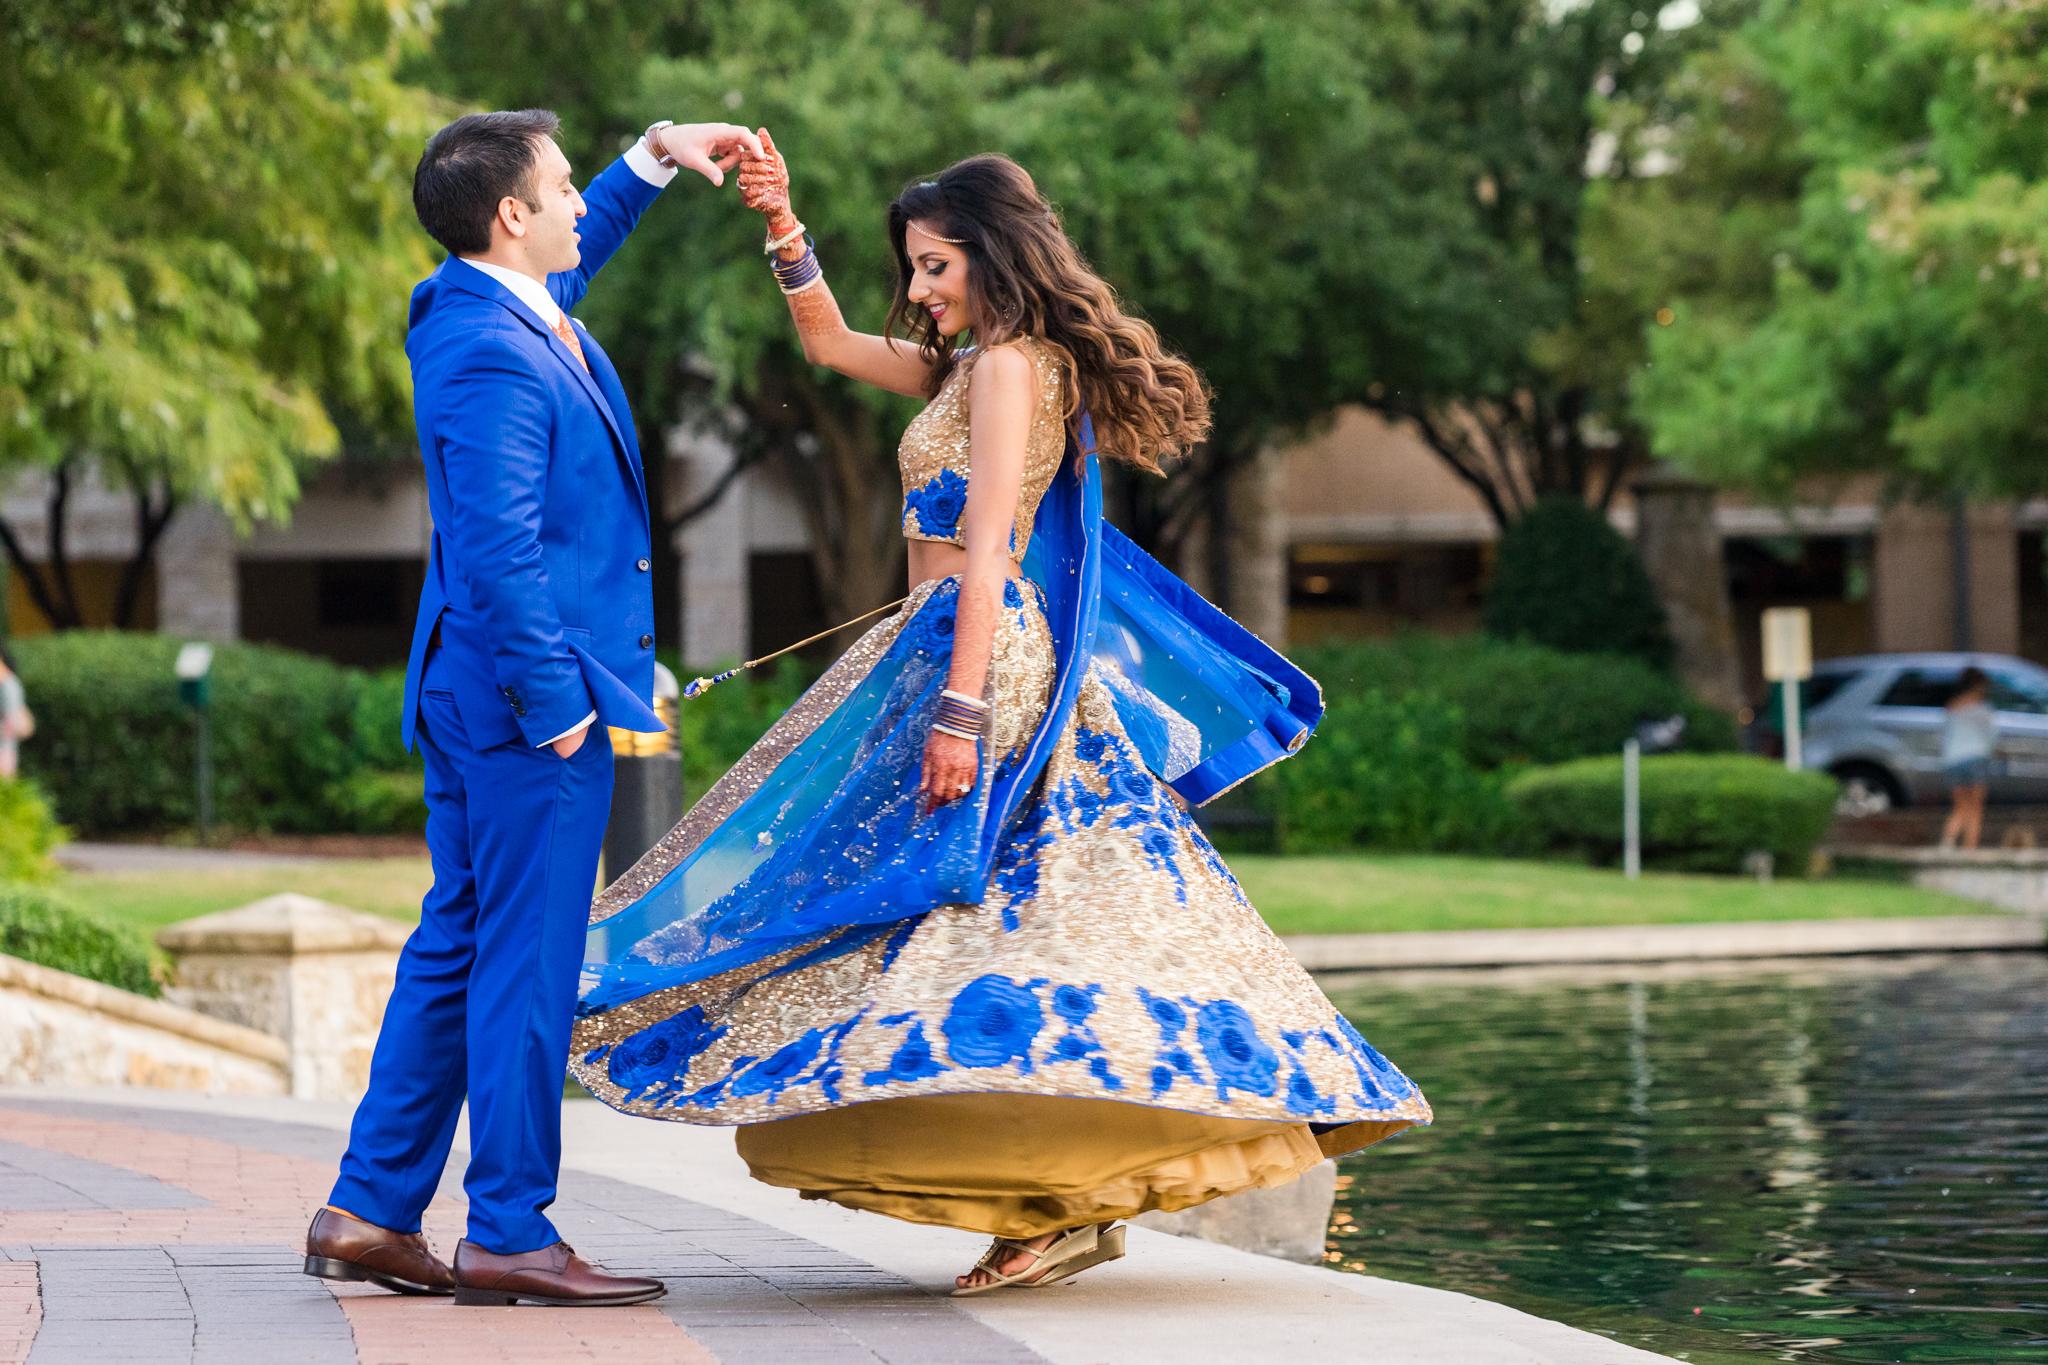 ReeyaAman-Wedding-Photography-www.MnMfoto.comMnMfoto-Krishna-Sajan-1461.jpg